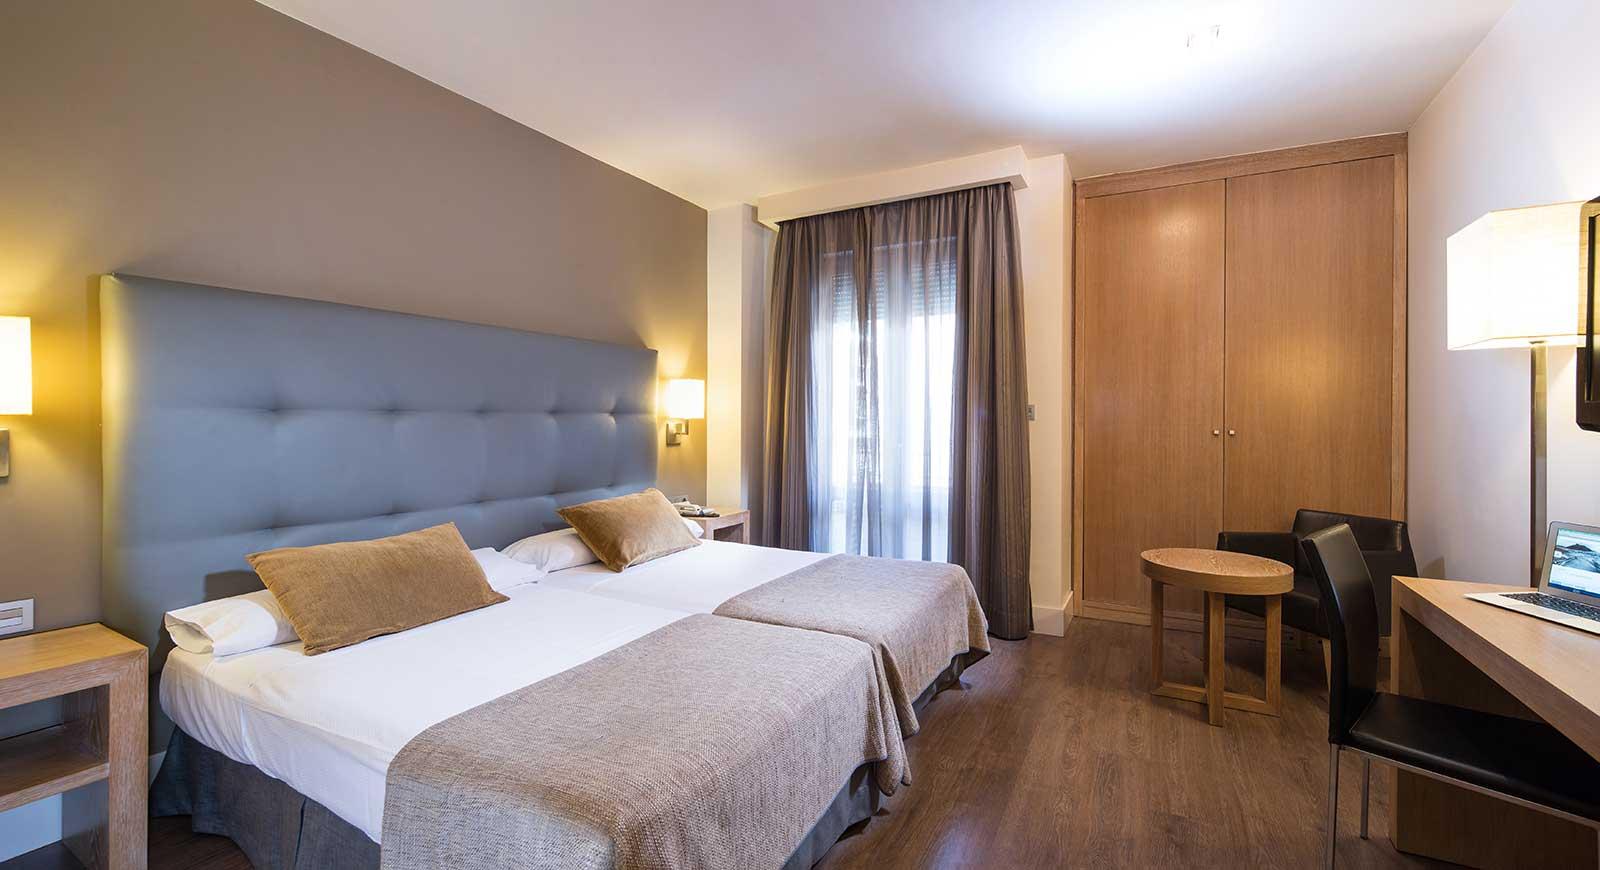 Habitación doble Superior dos camas separadas del hotel Barceló Carmen